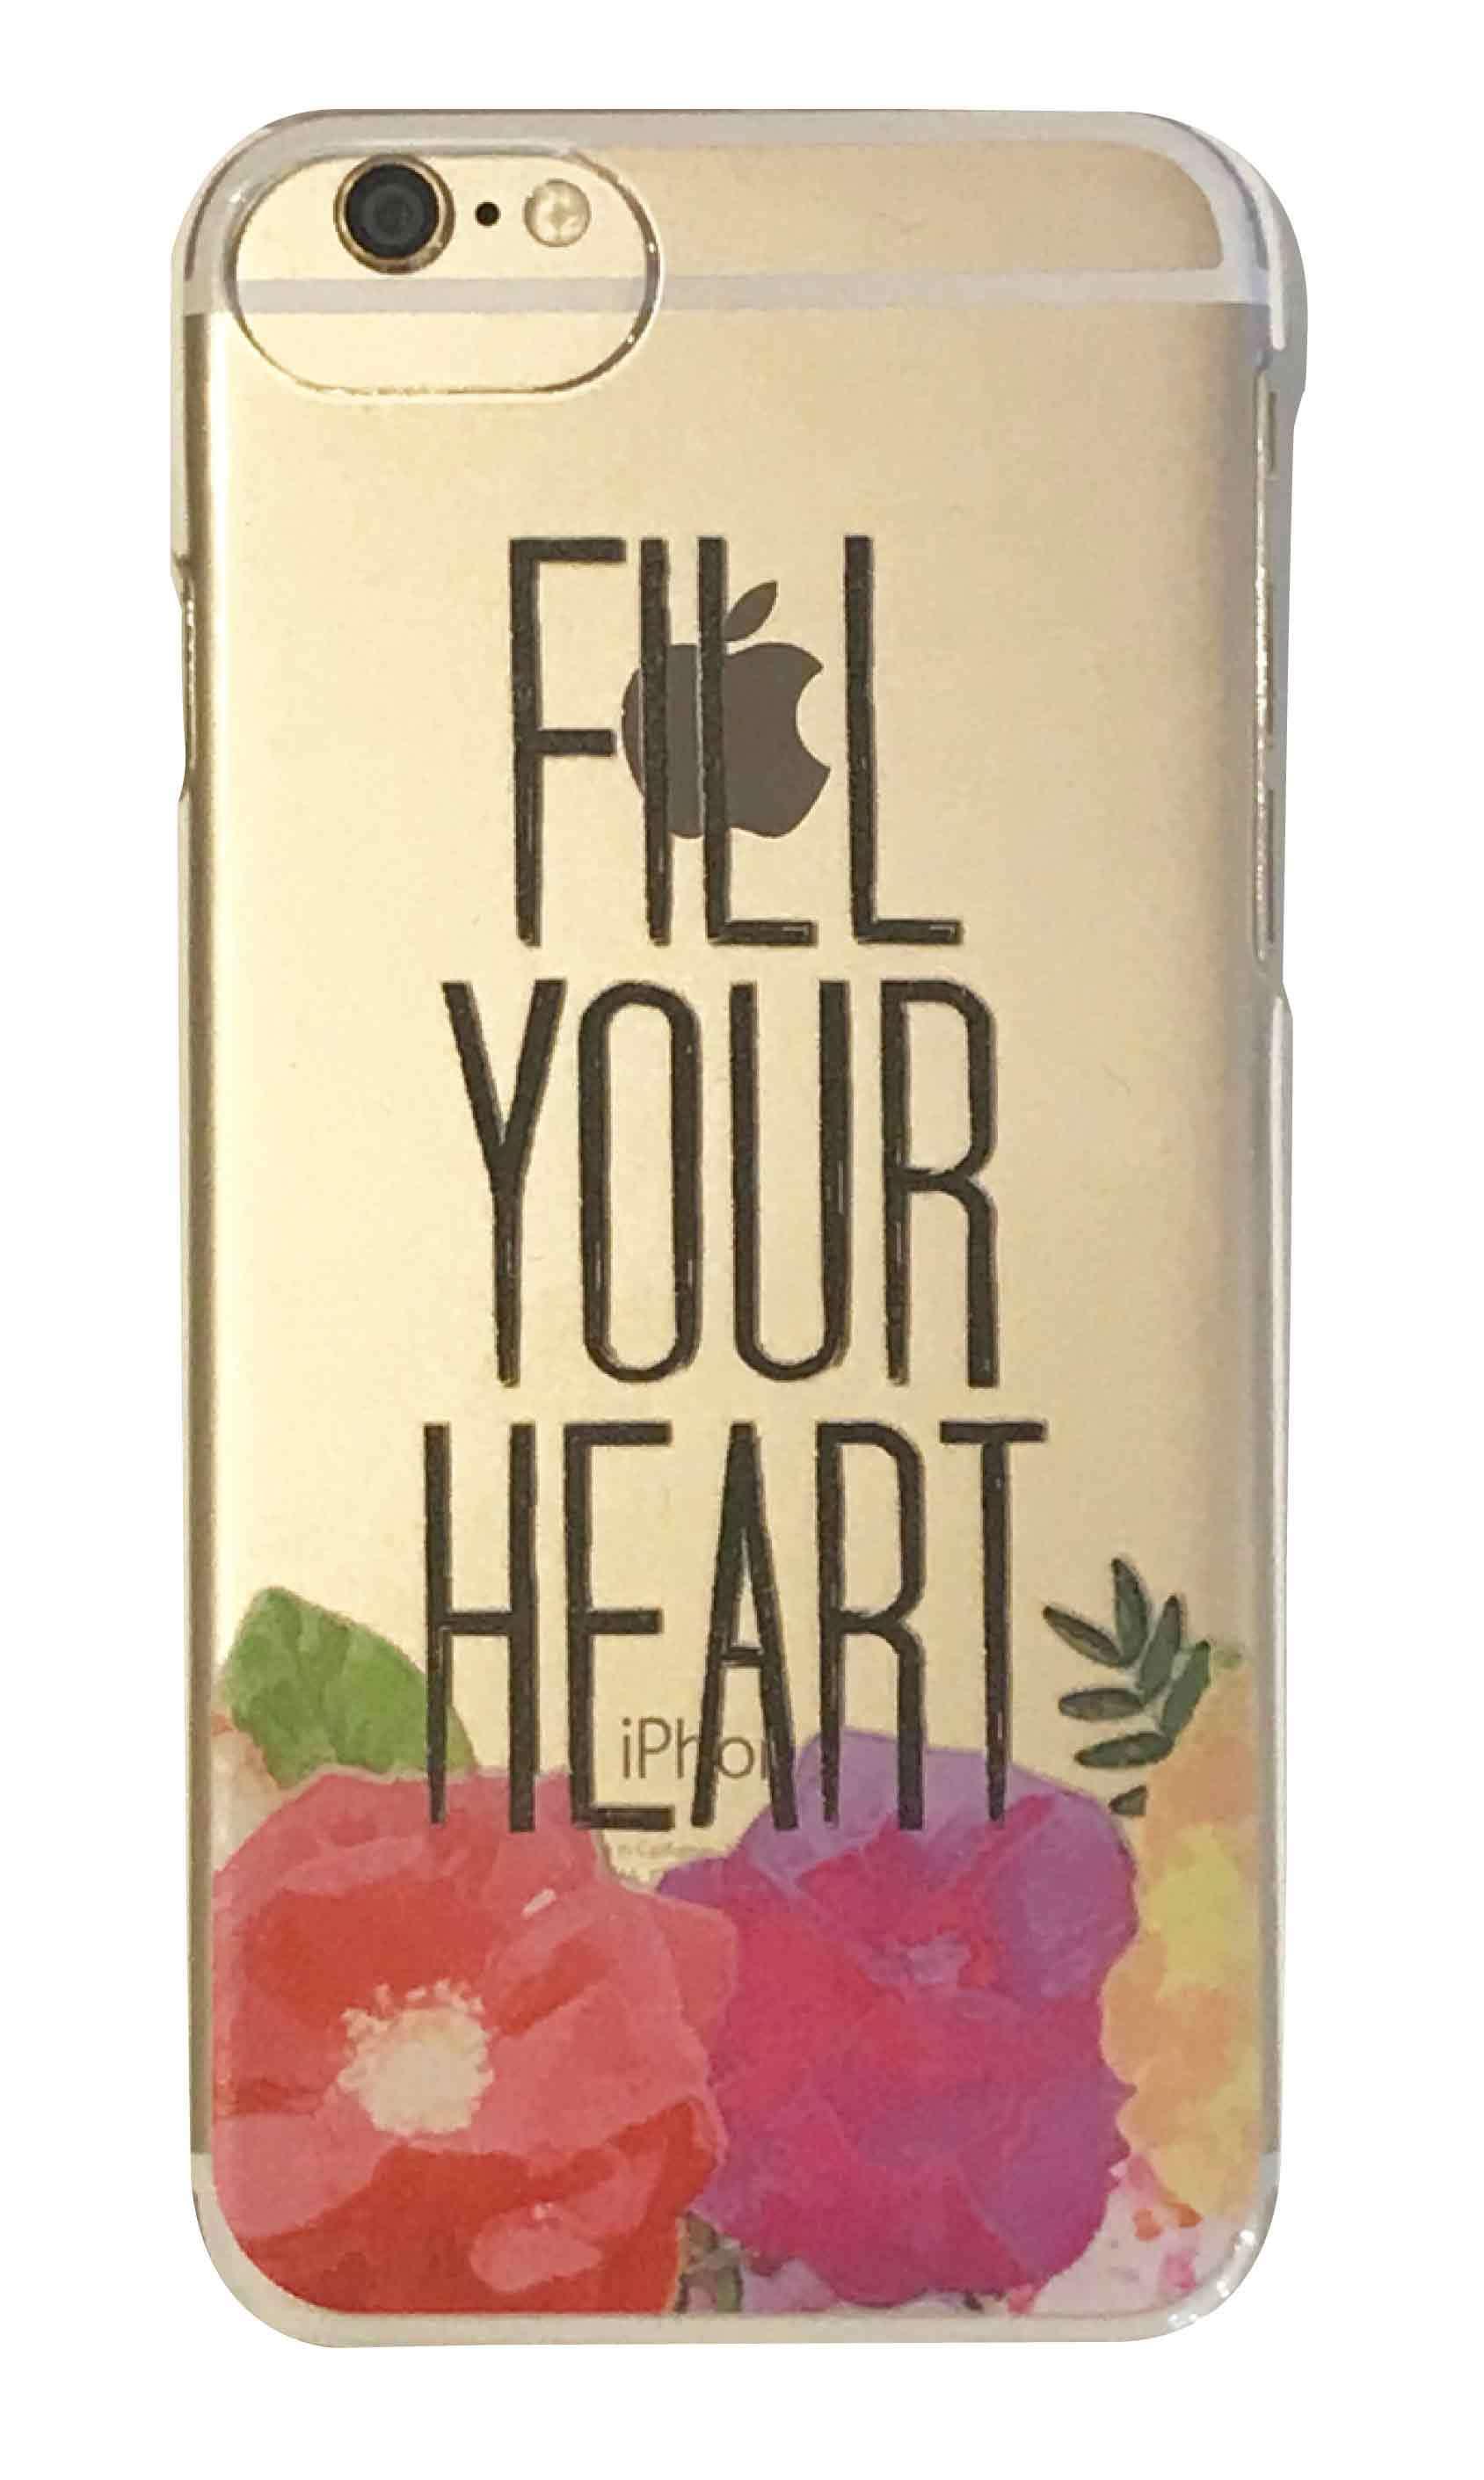 FULL YOUR HEART クリアハードケース